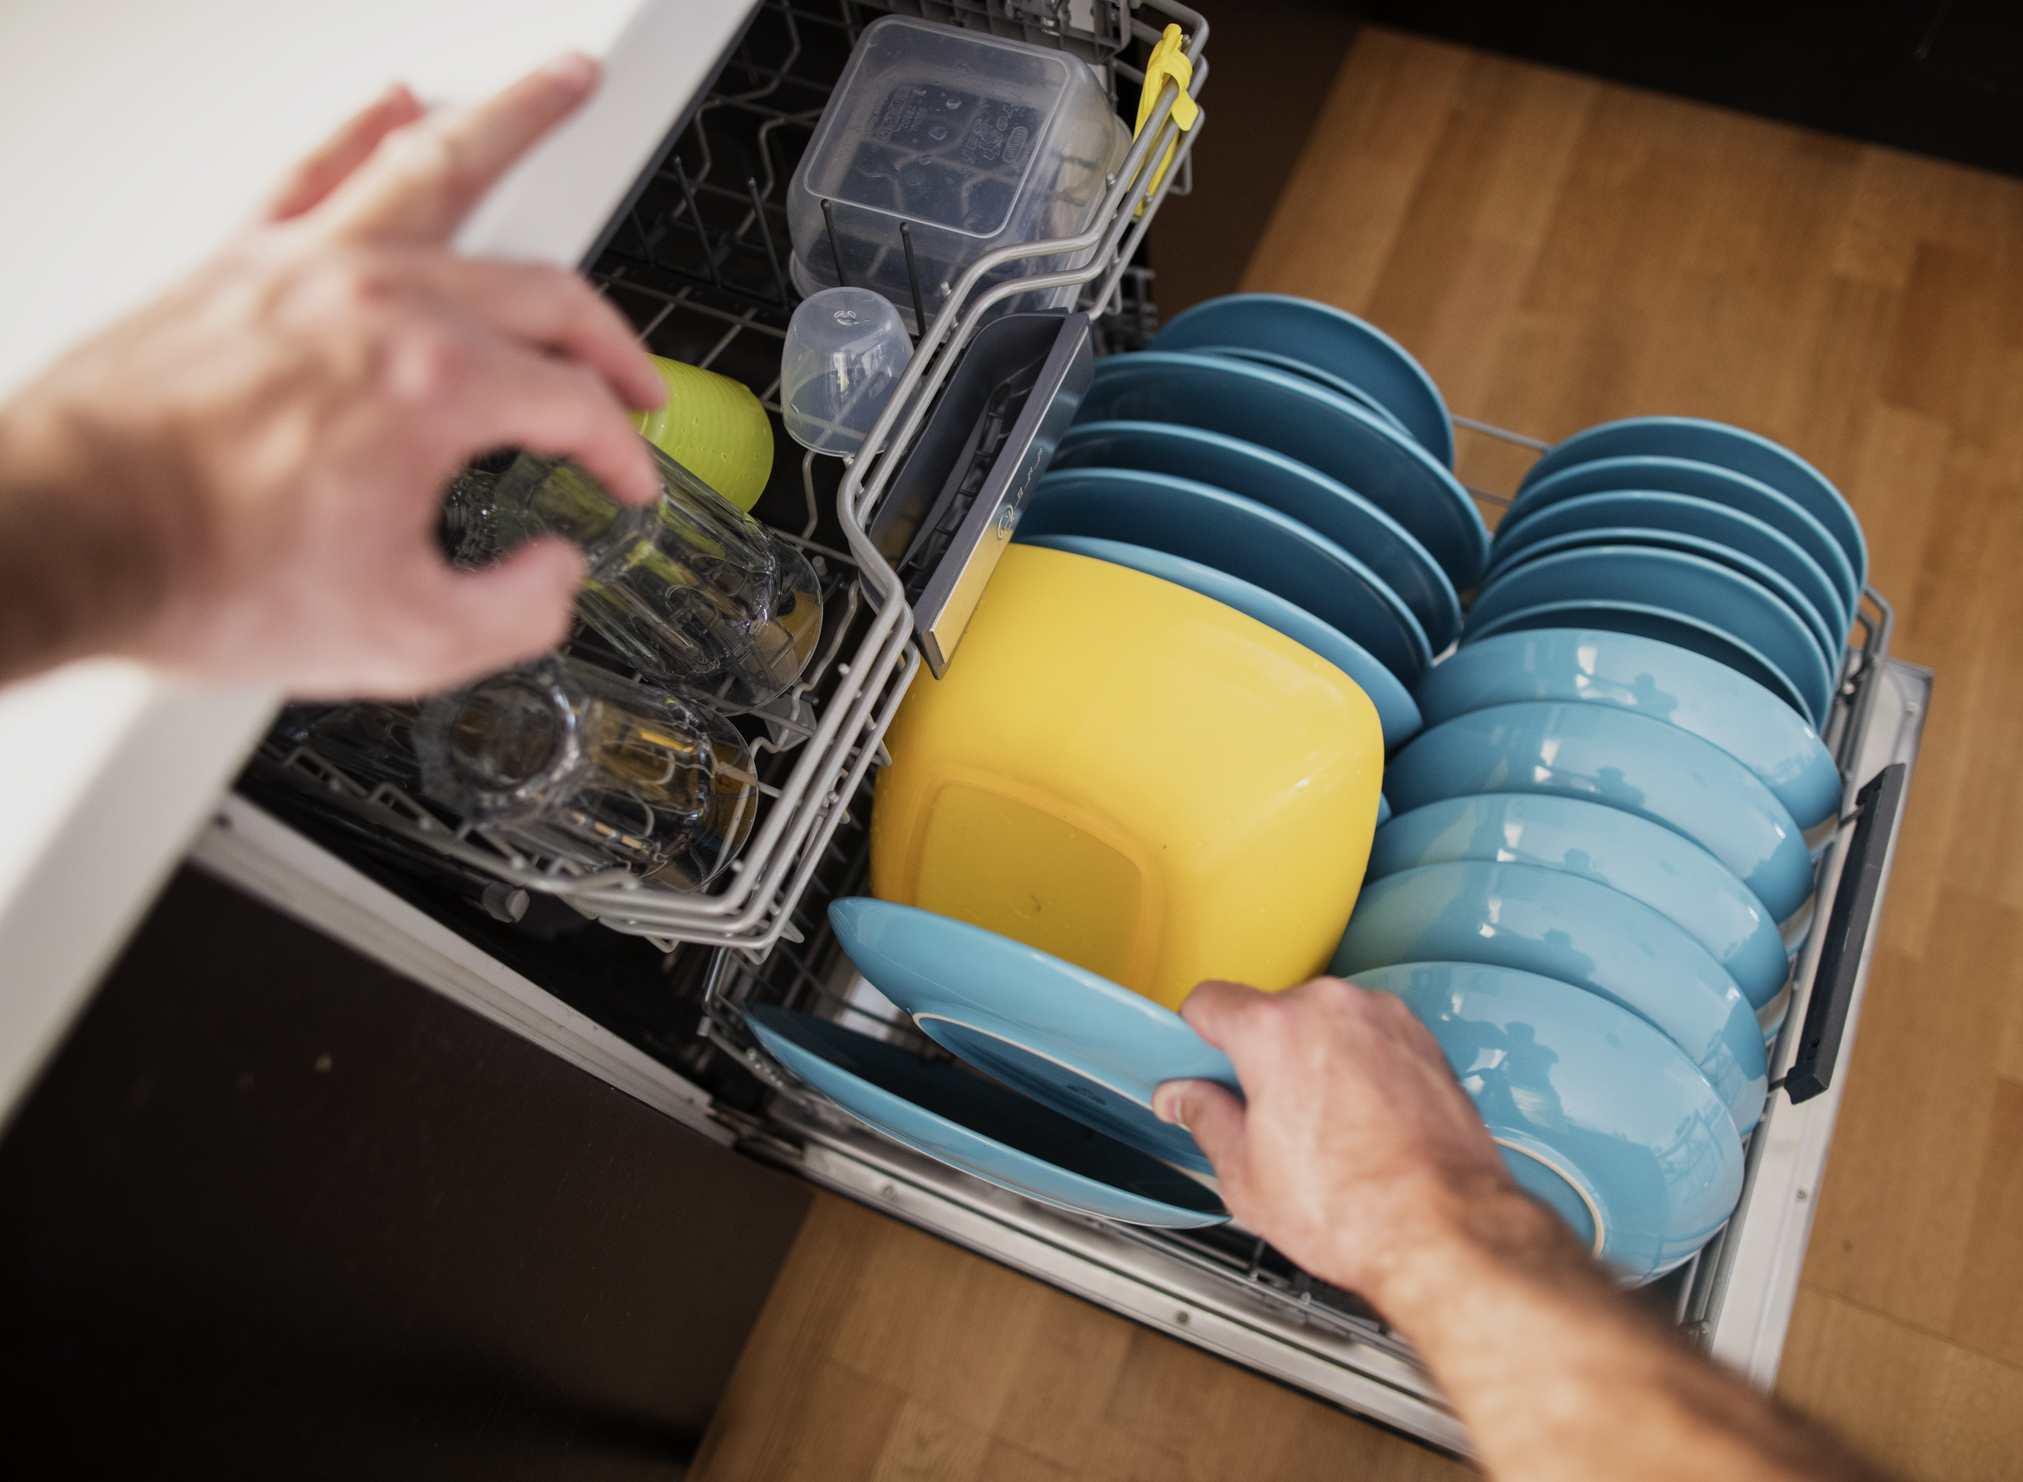 Filling dishwasher